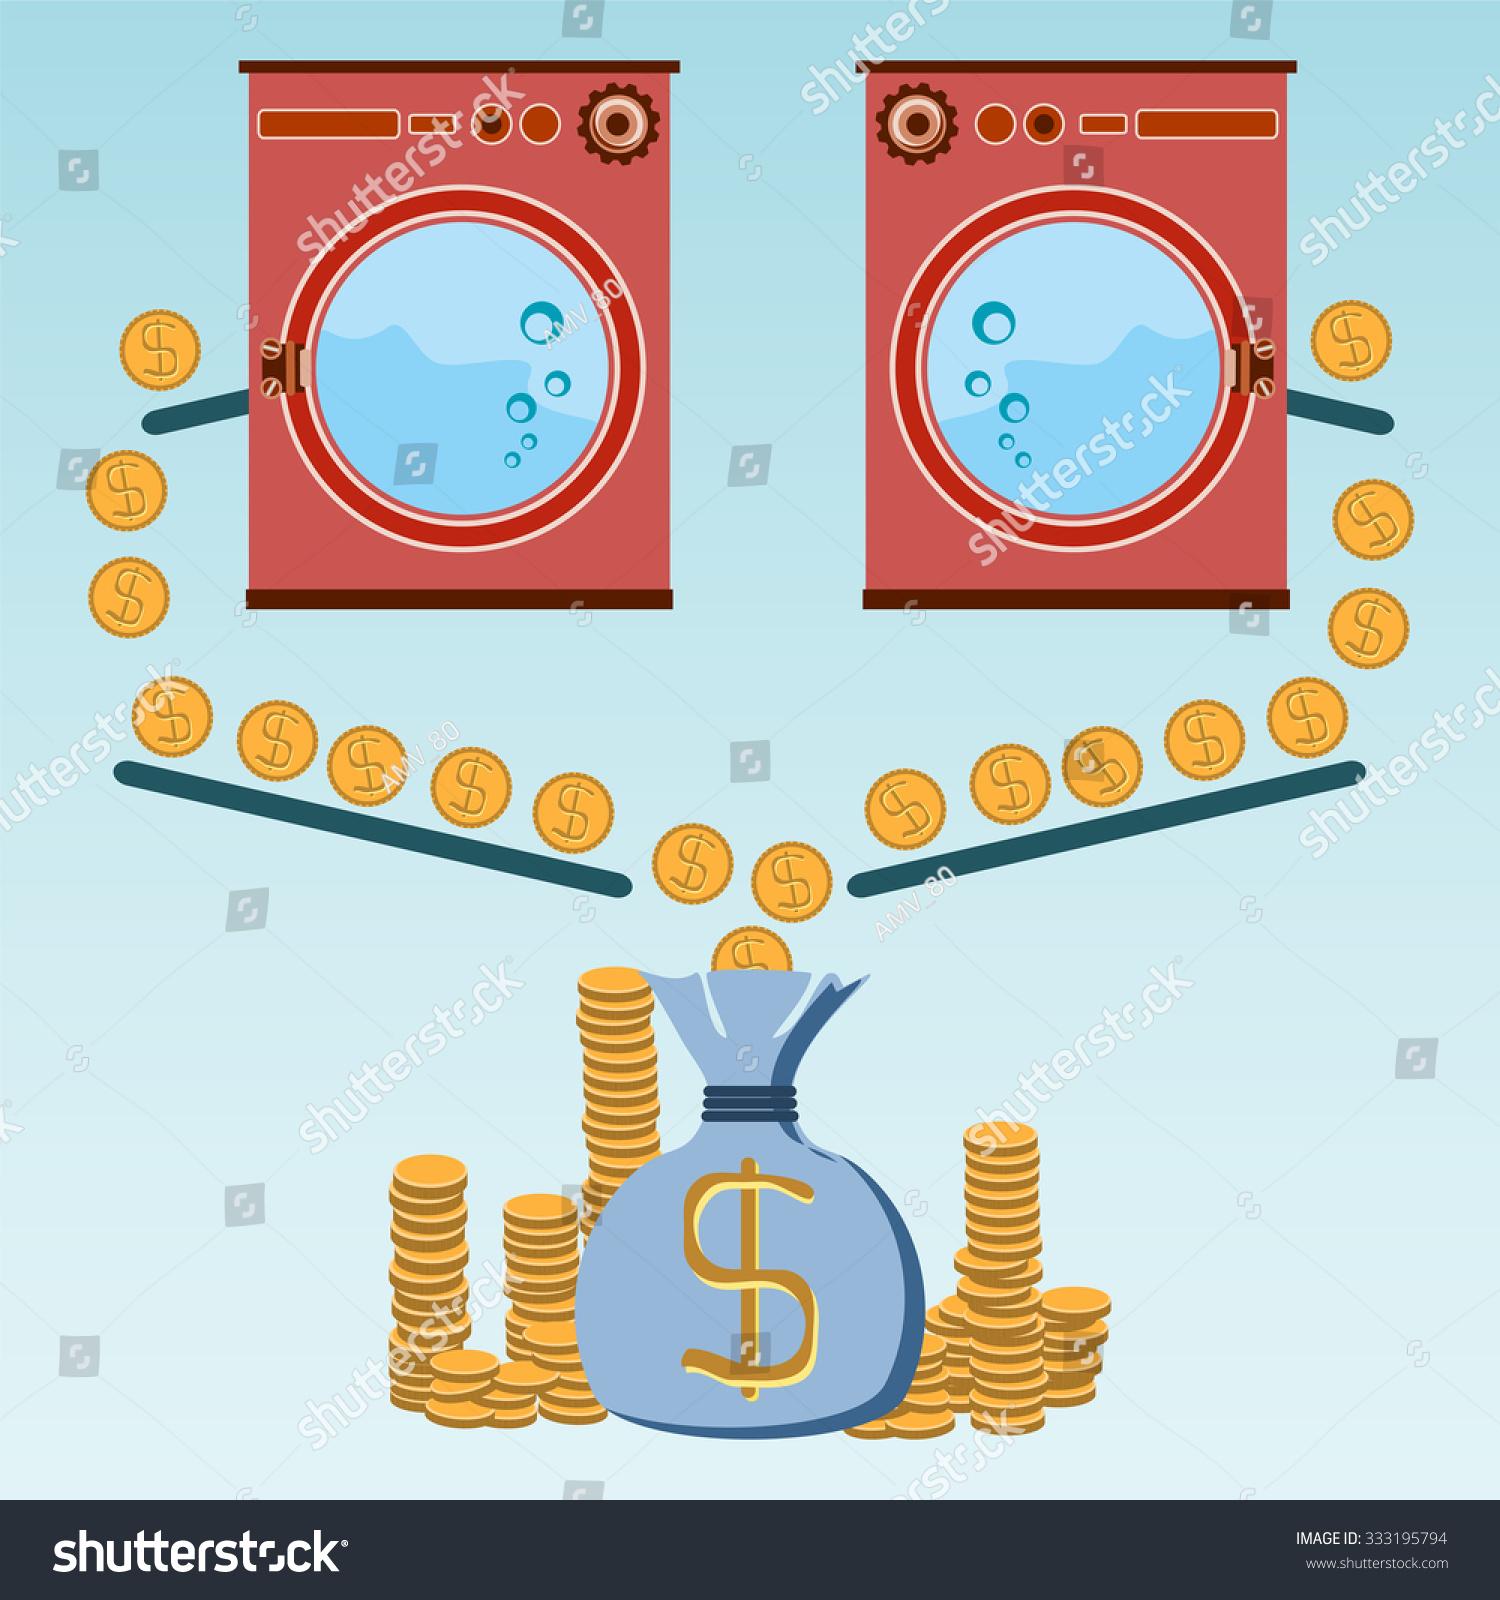 Profit laundry room washing machines appliances stock vector profit from the laundry room washing machines appliances store payment for goods and buycottarizona Images